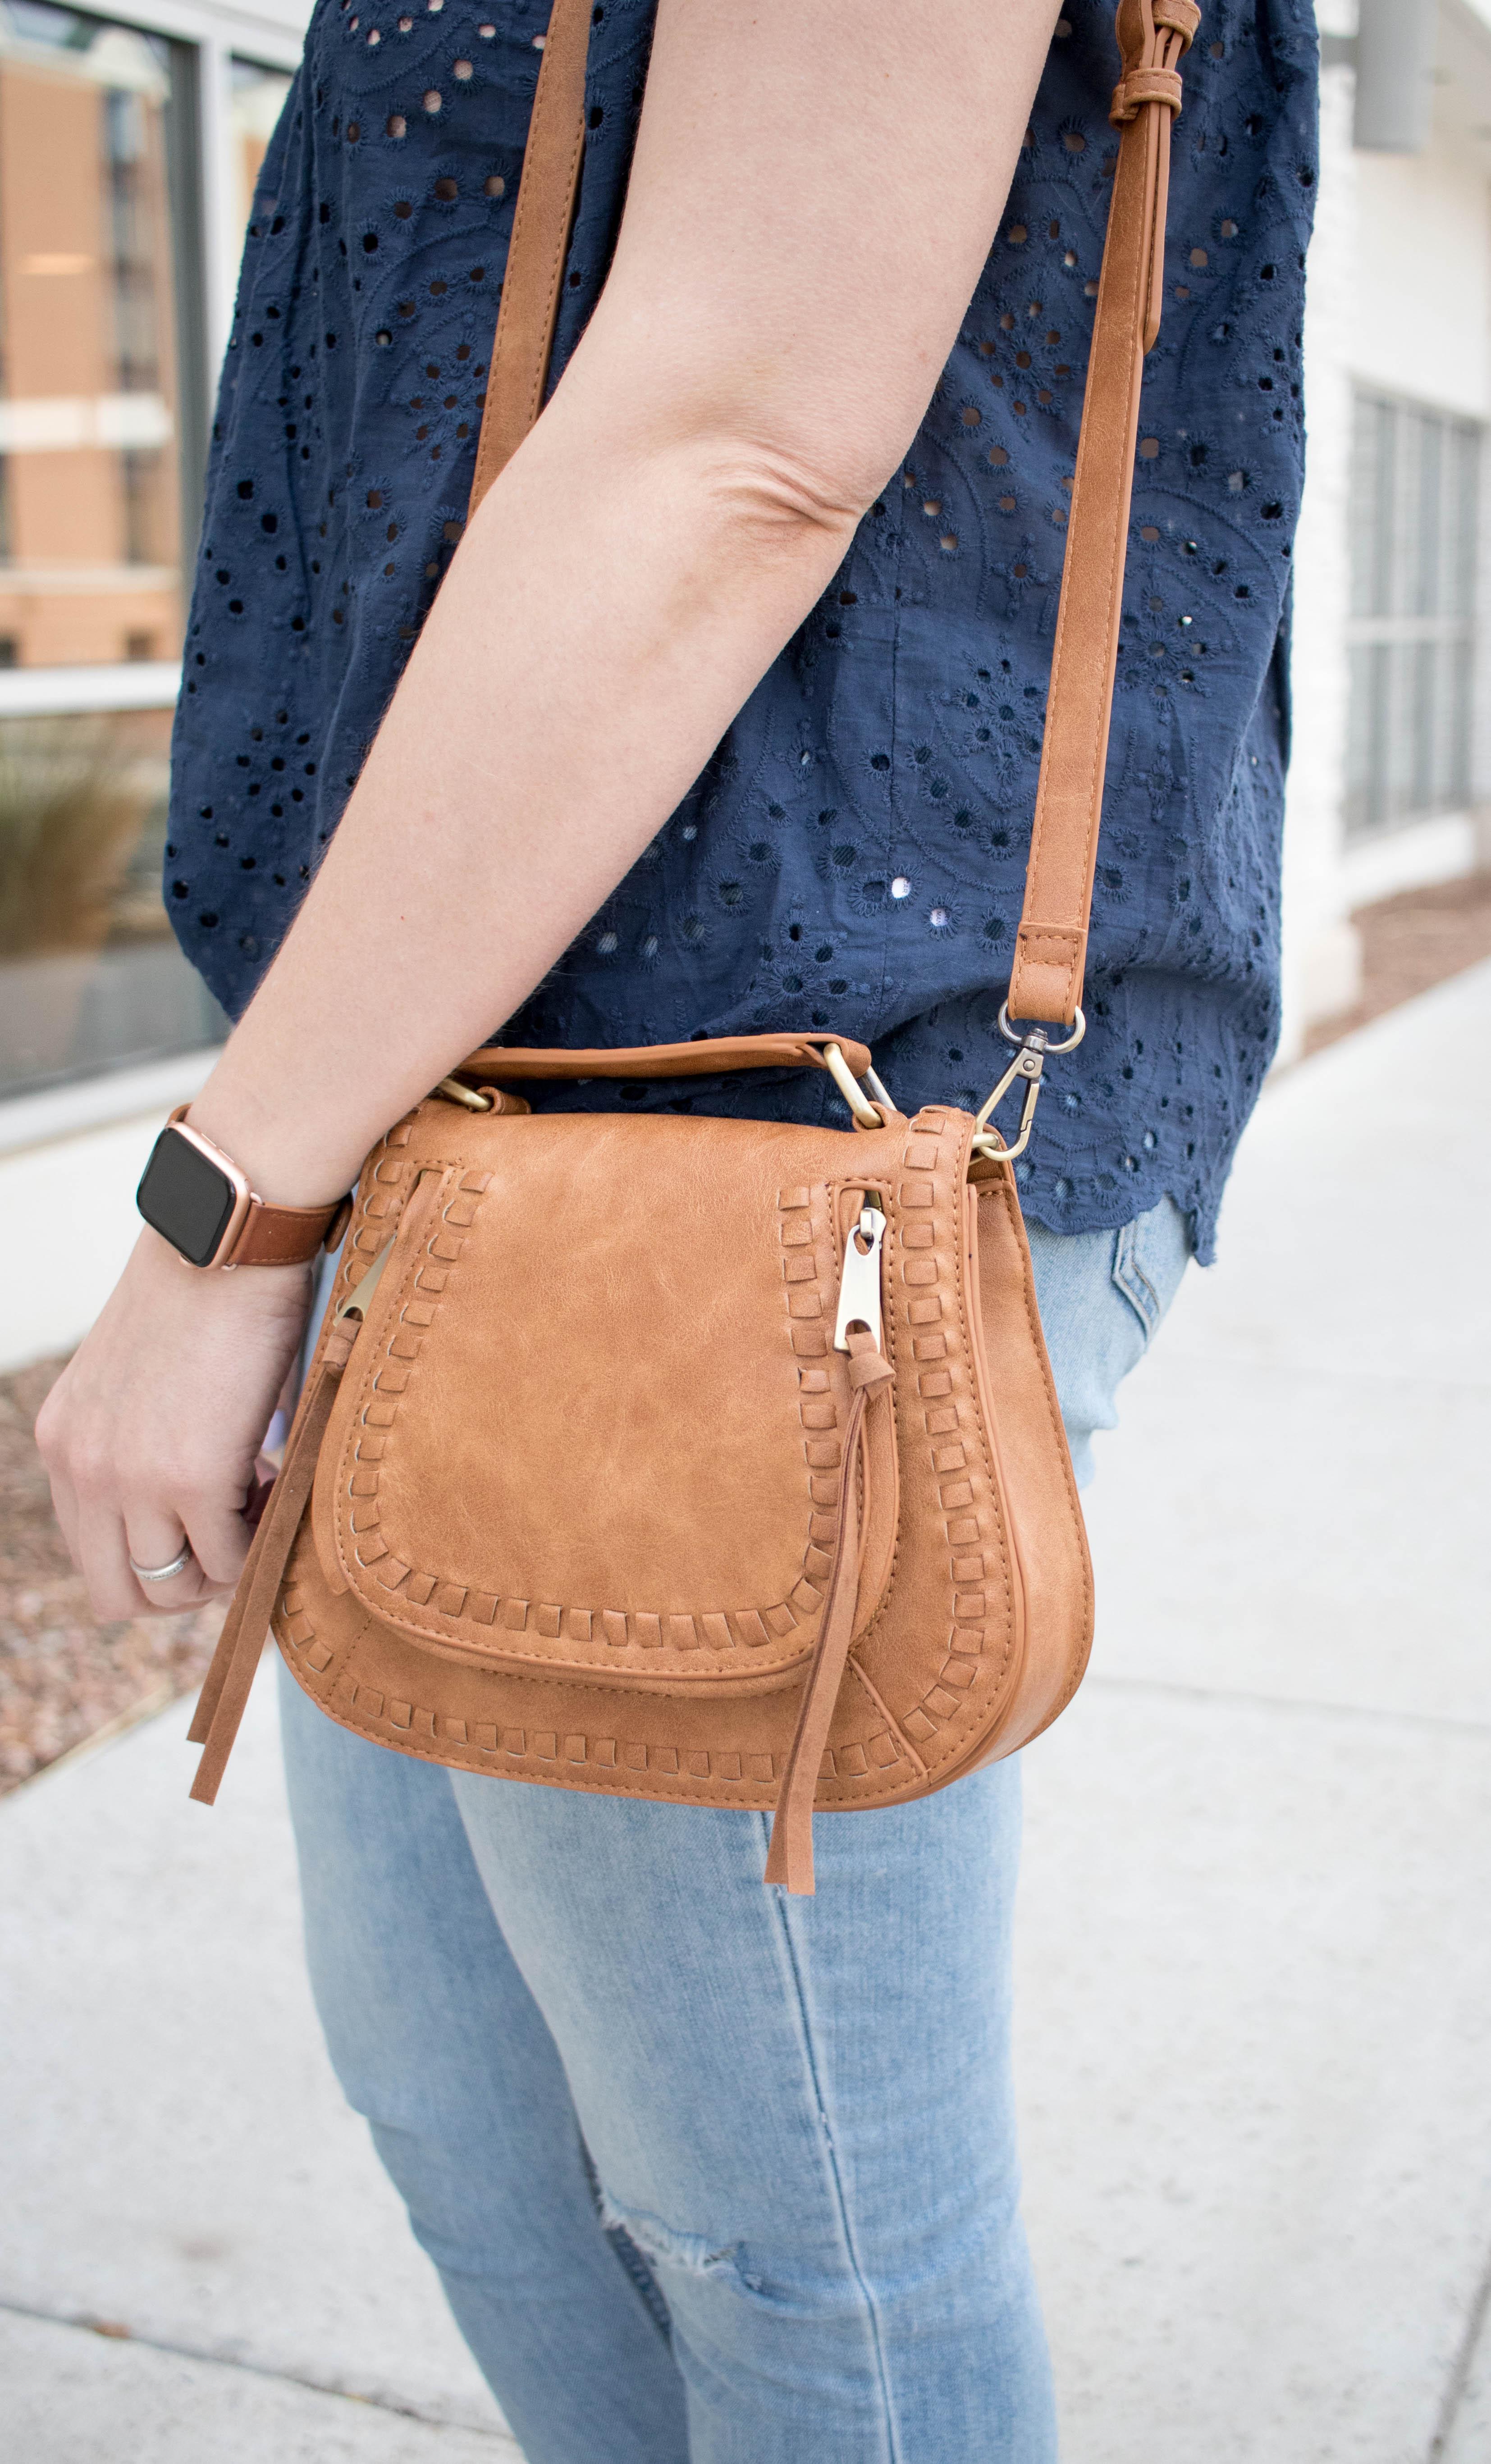 Rebecca Minkoff handbag dupe #outfitdetails #springaccessories #purse